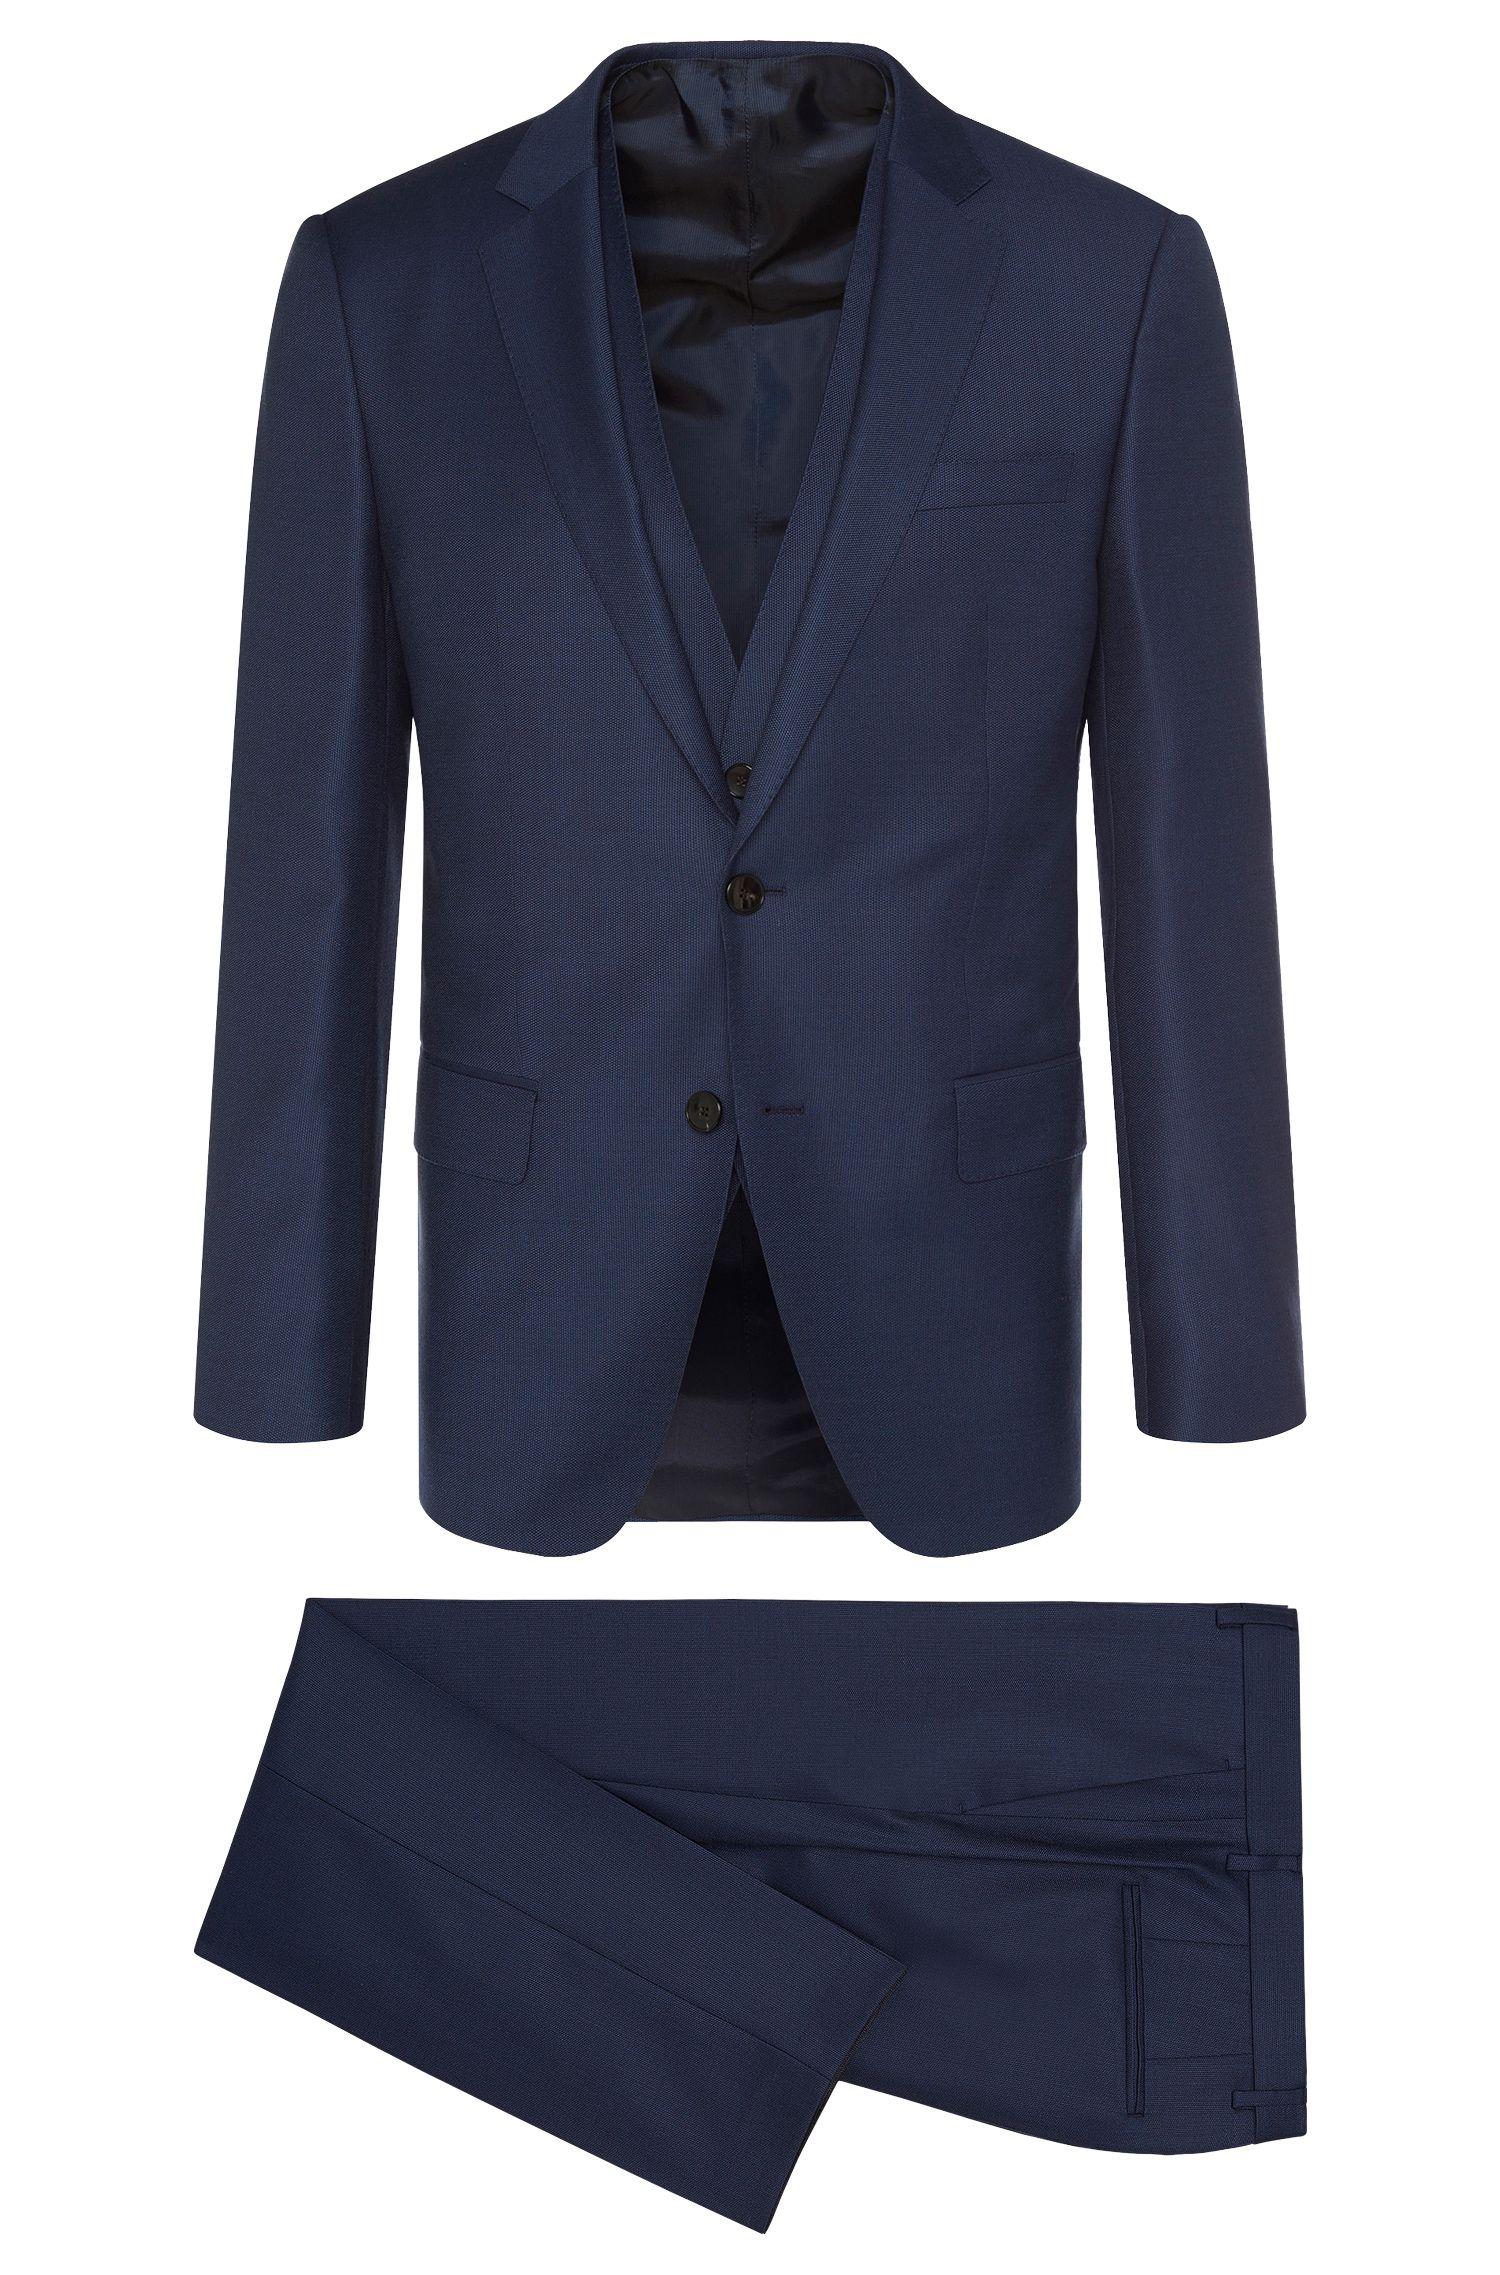 'Hevans/Gill WE' | Slim Fit, Italian Super 120 Virgin Wool 3-Piece Suit